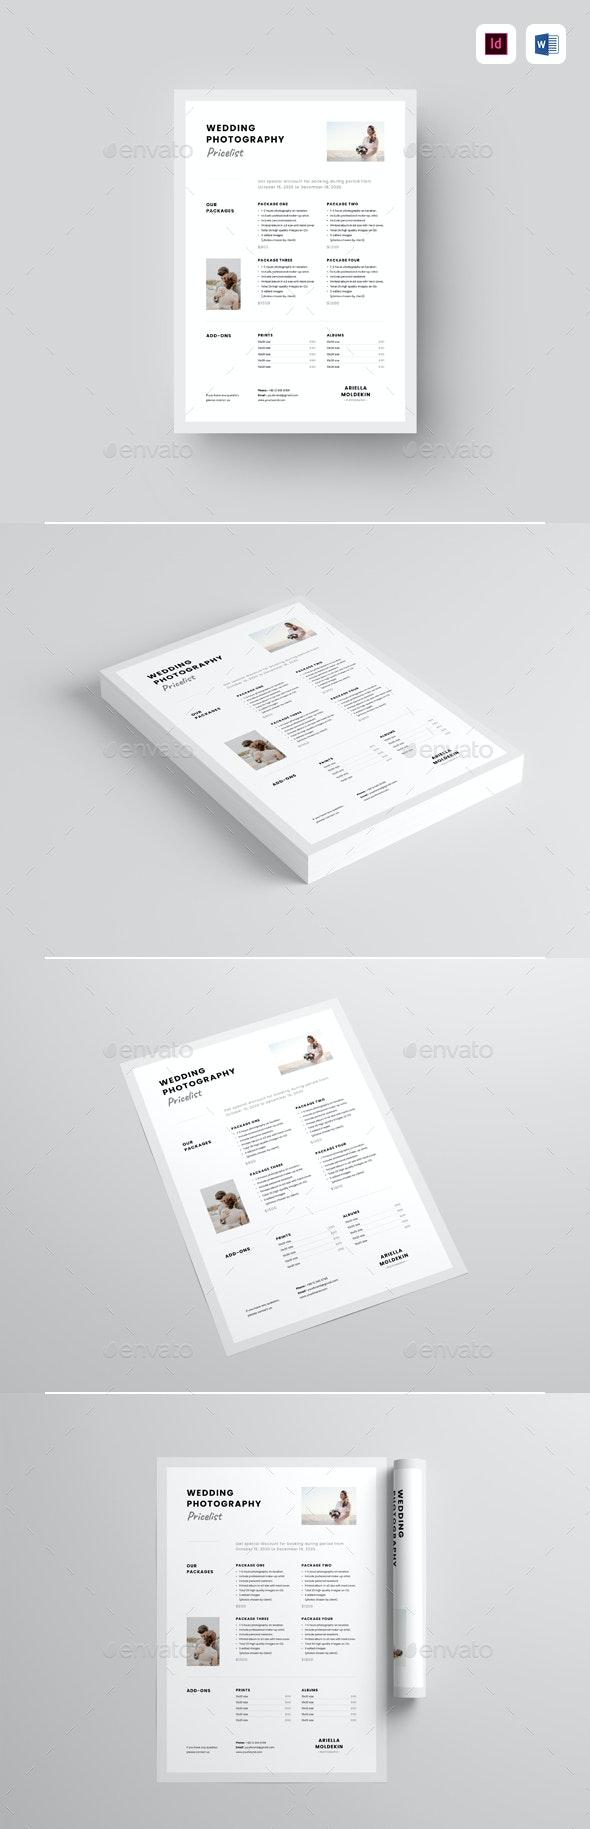 Photography Pricelist - Corporate Flyers